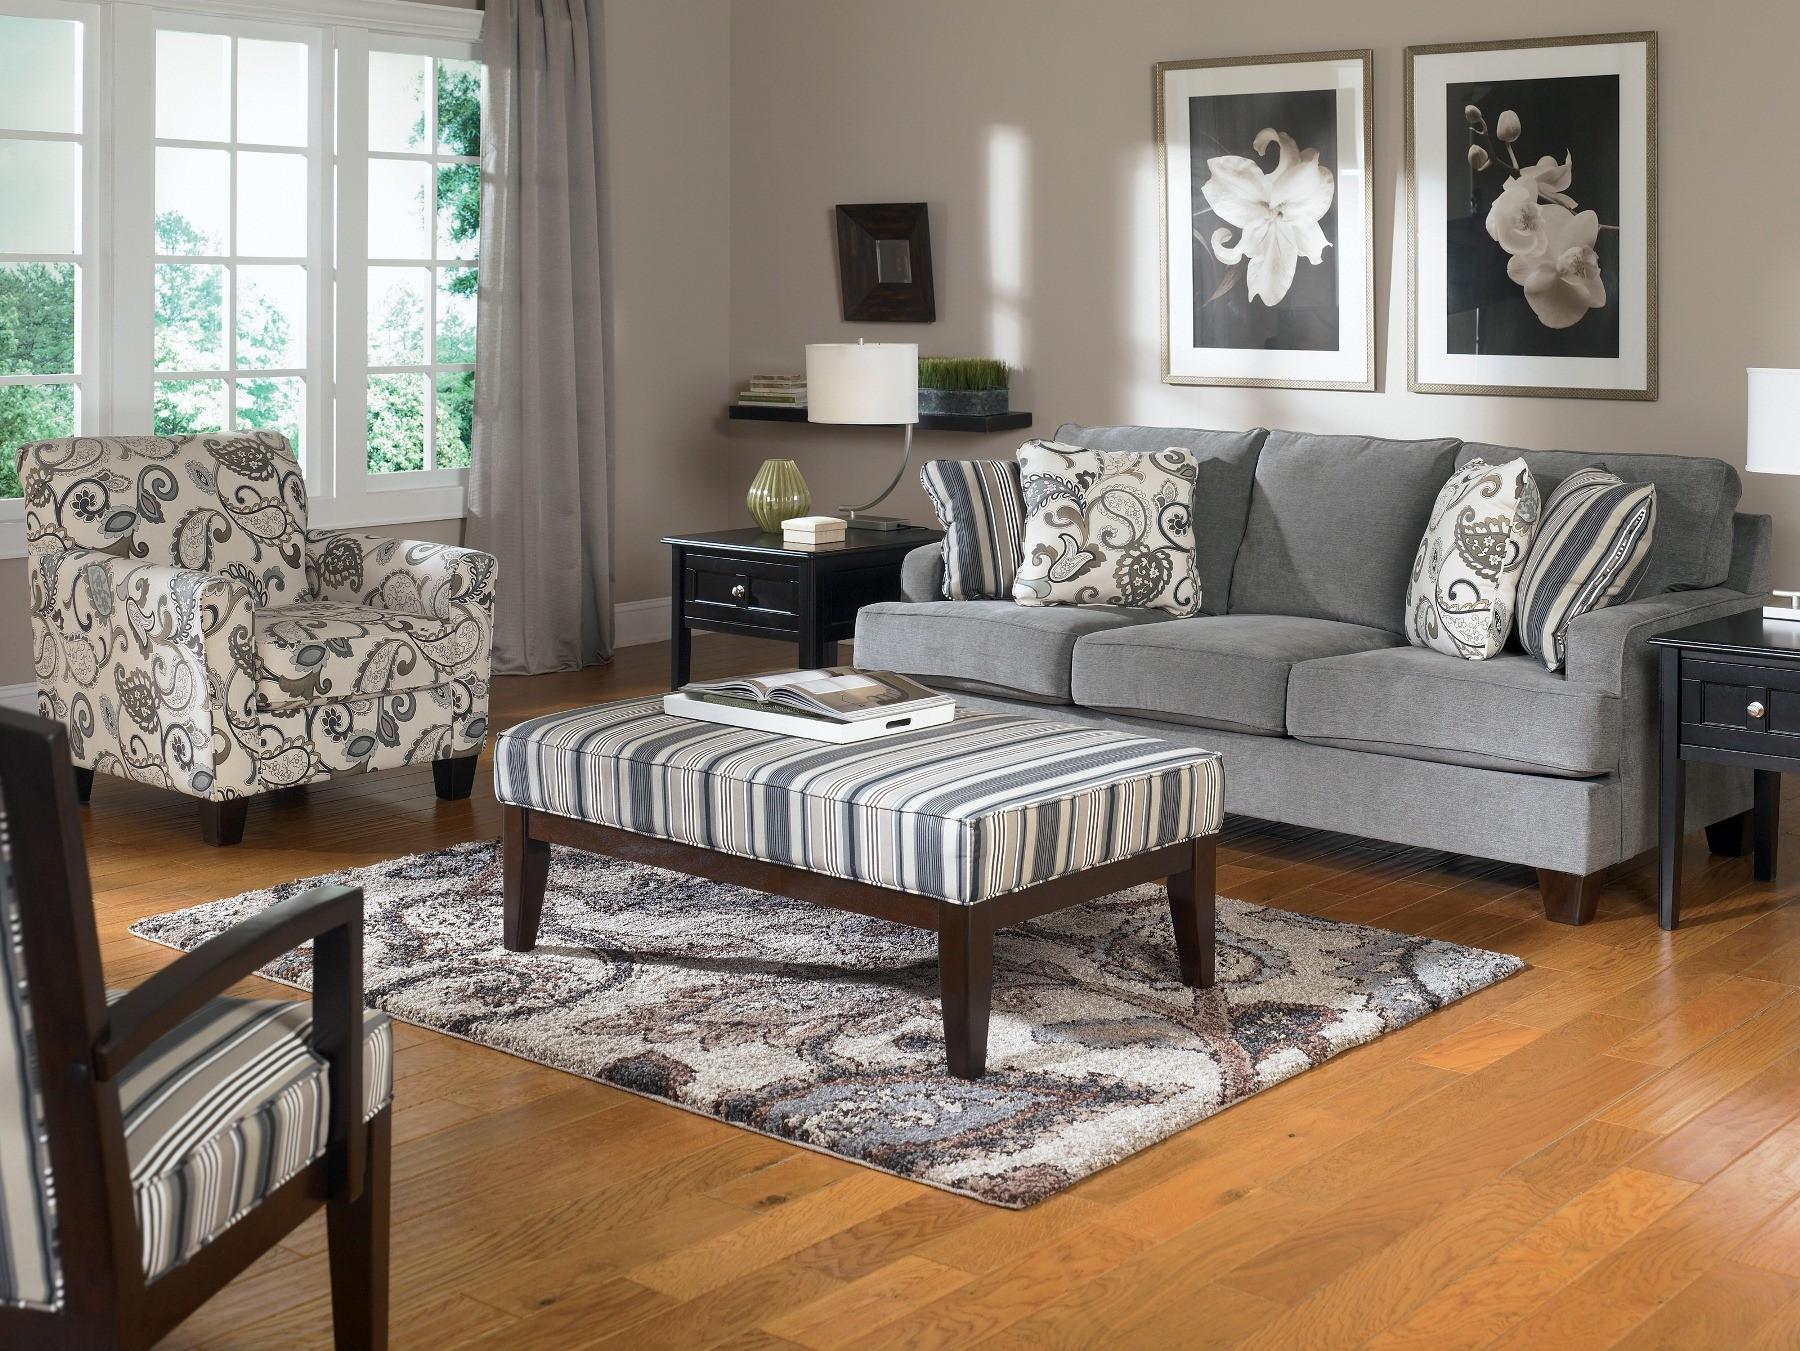 Yvette steel living room set from ashley 77900 coleman - Living room furniture sets ashley ...